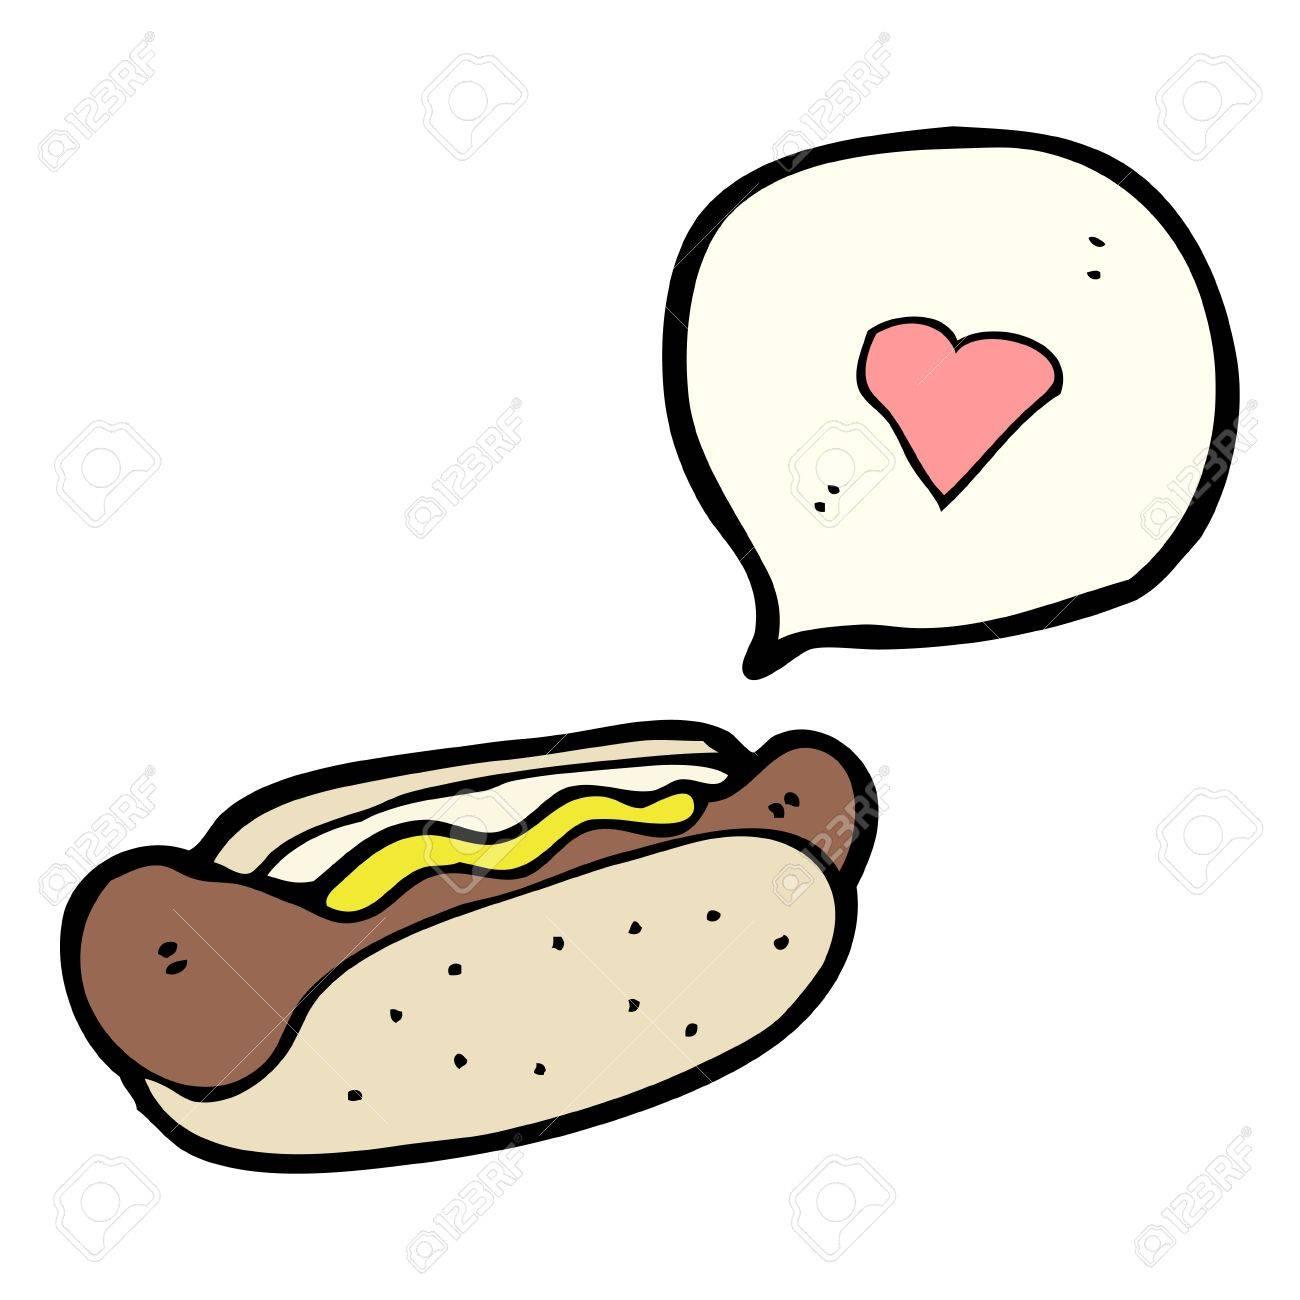 junk food love cartoon Stock Vector - 16533845